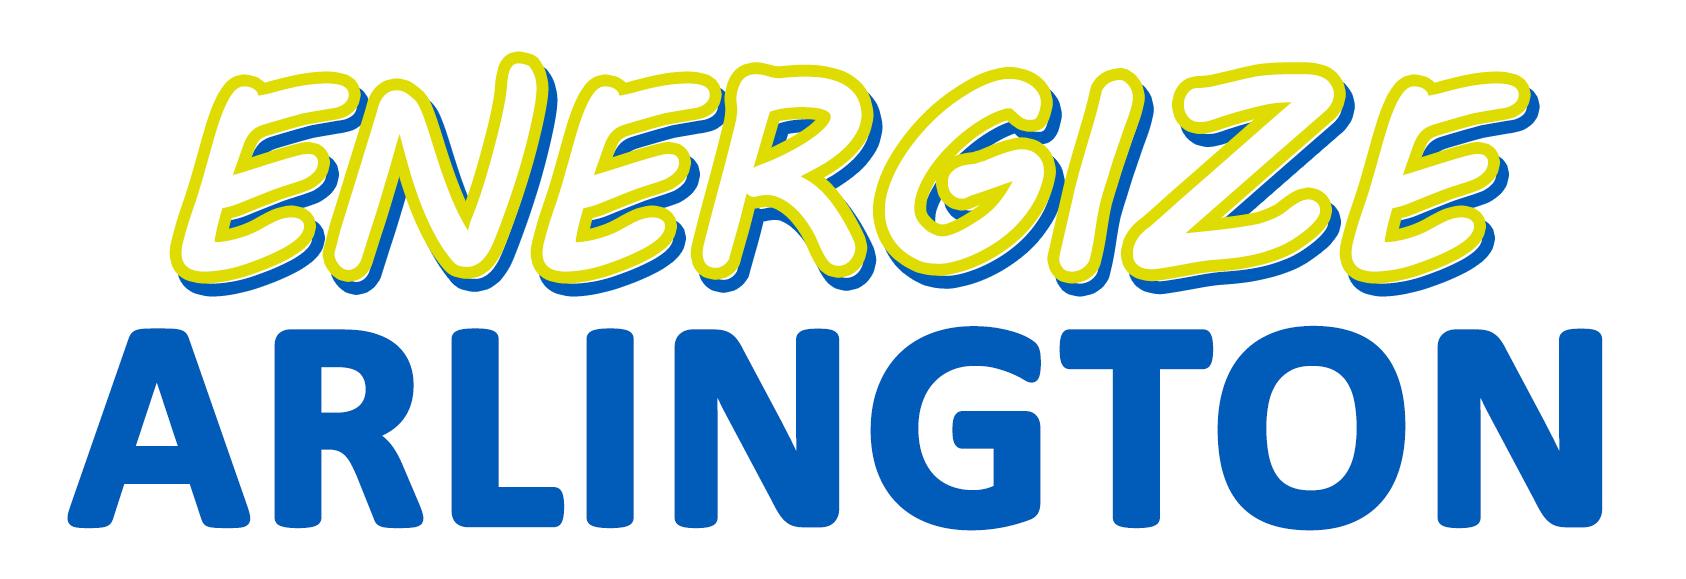 energize arlington logo